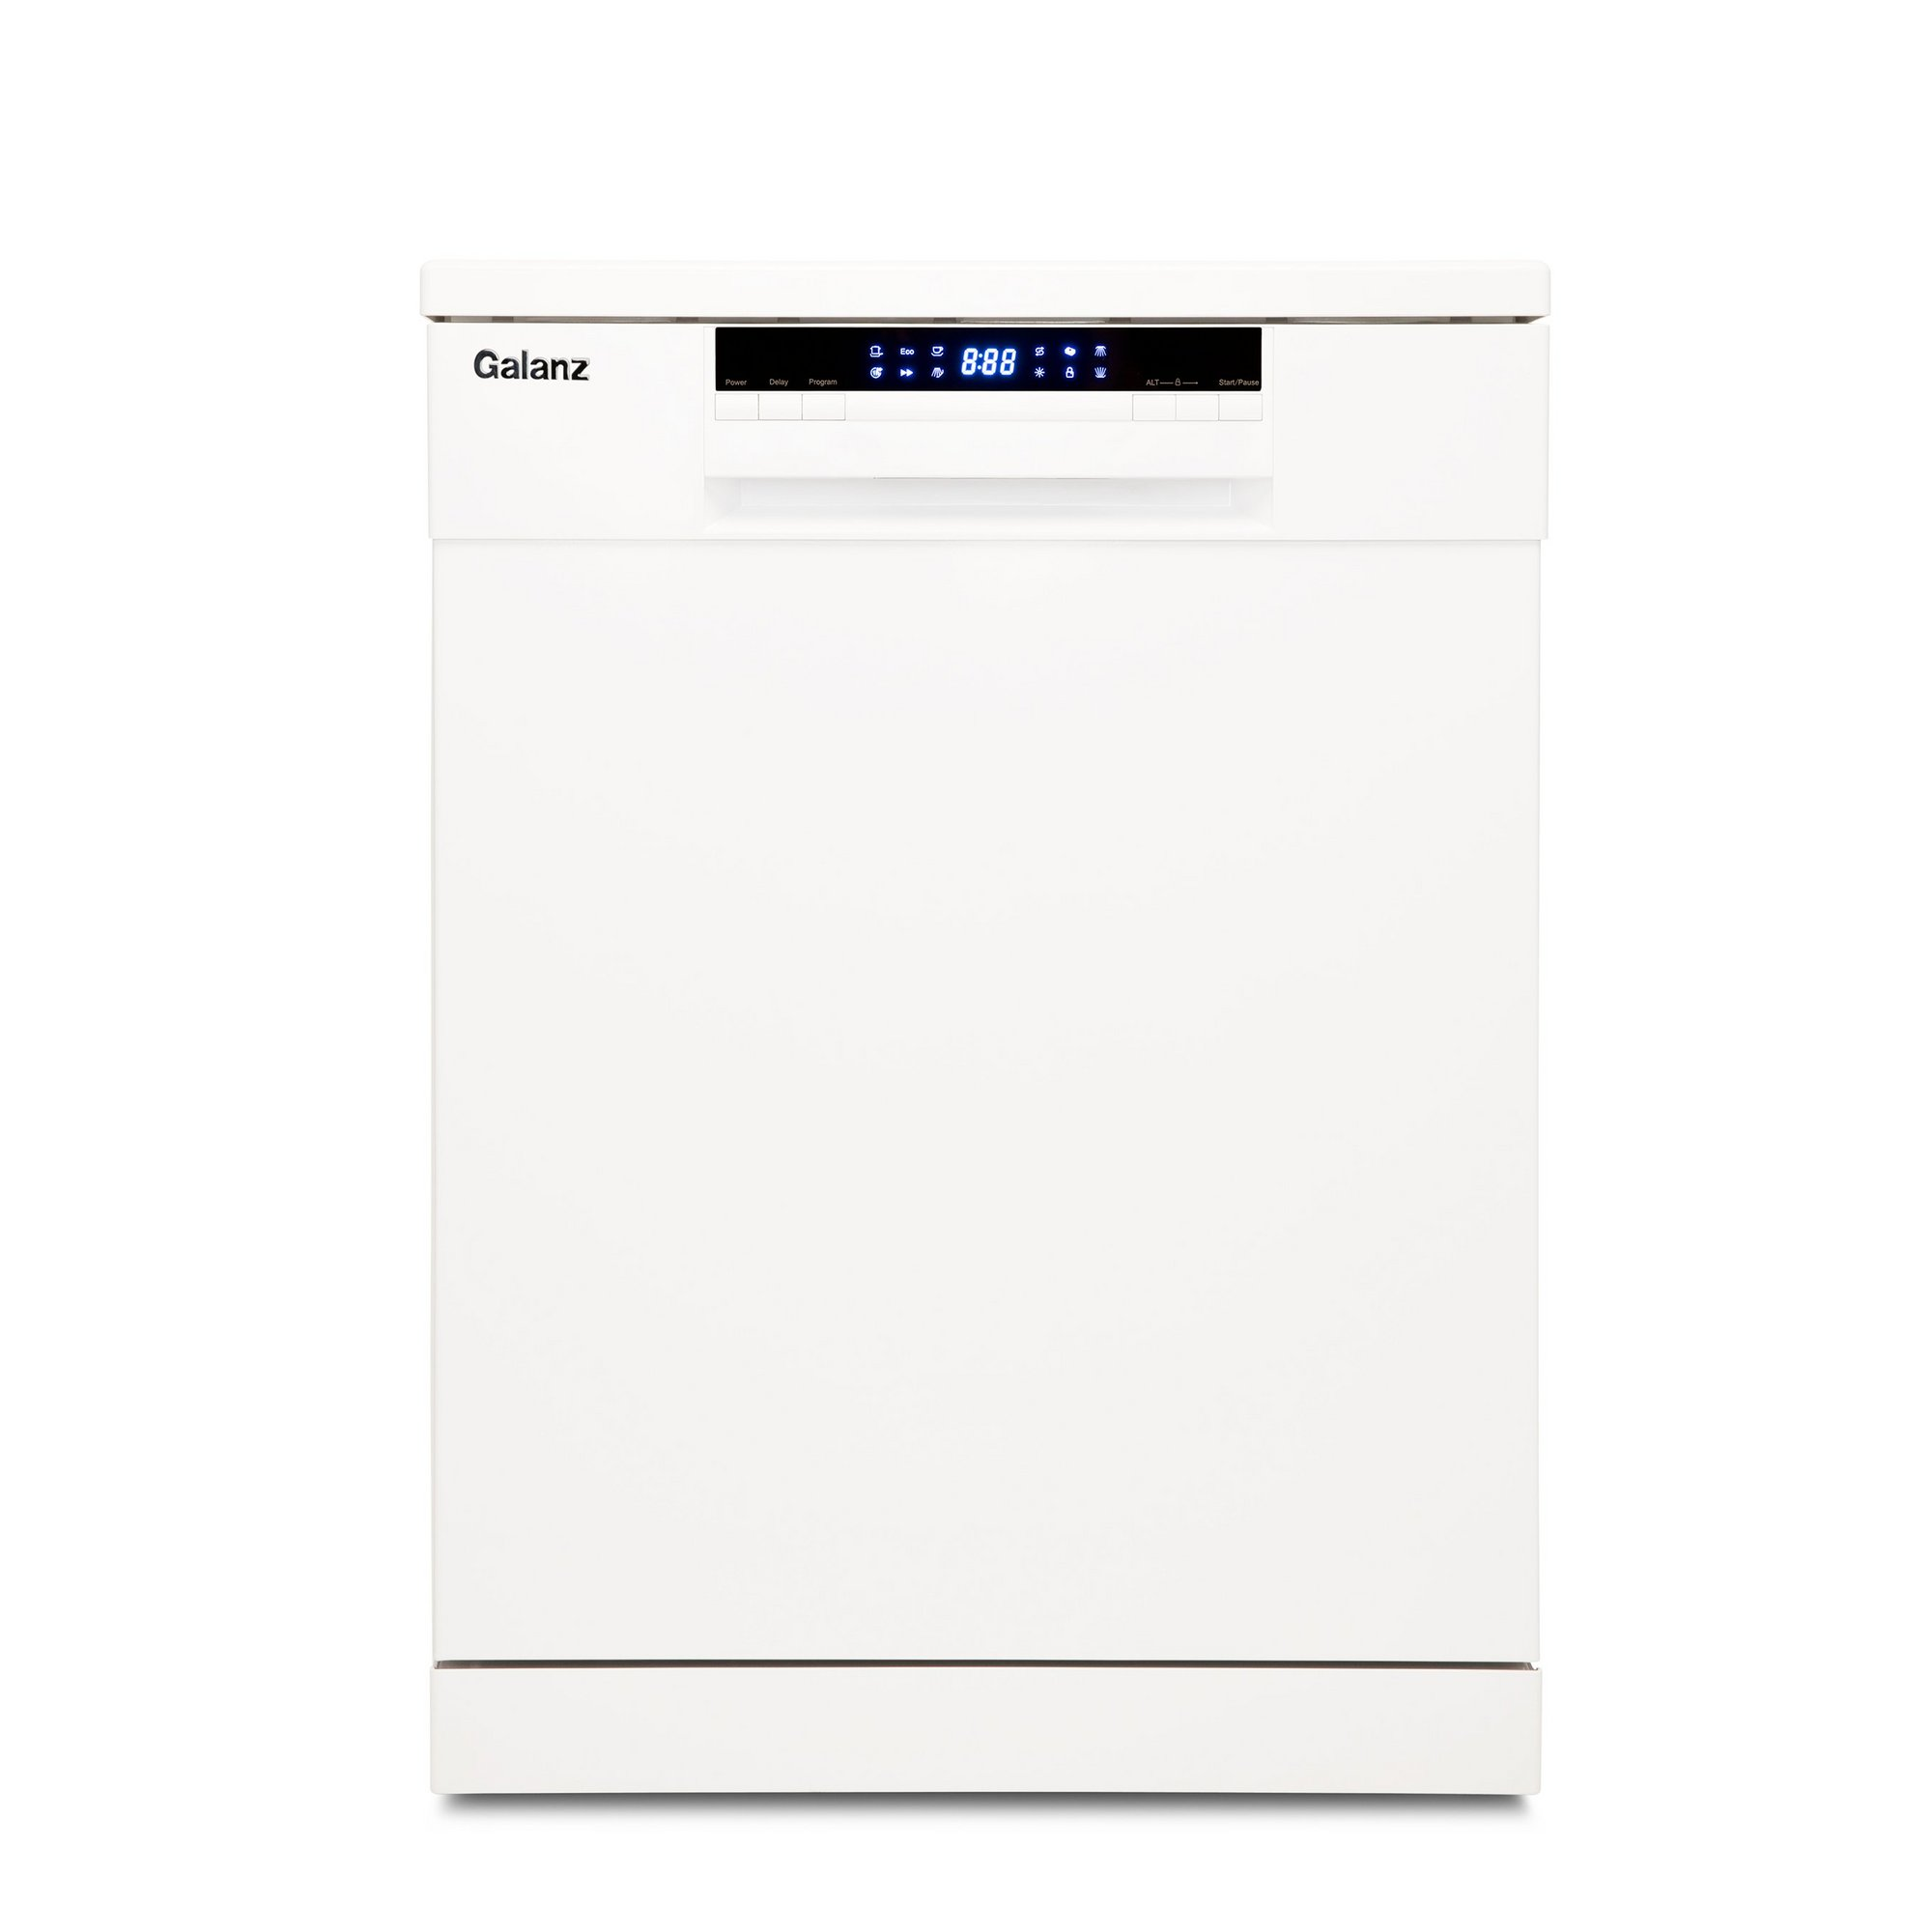 Image of Galanz 13 Place Setting Dishwasher